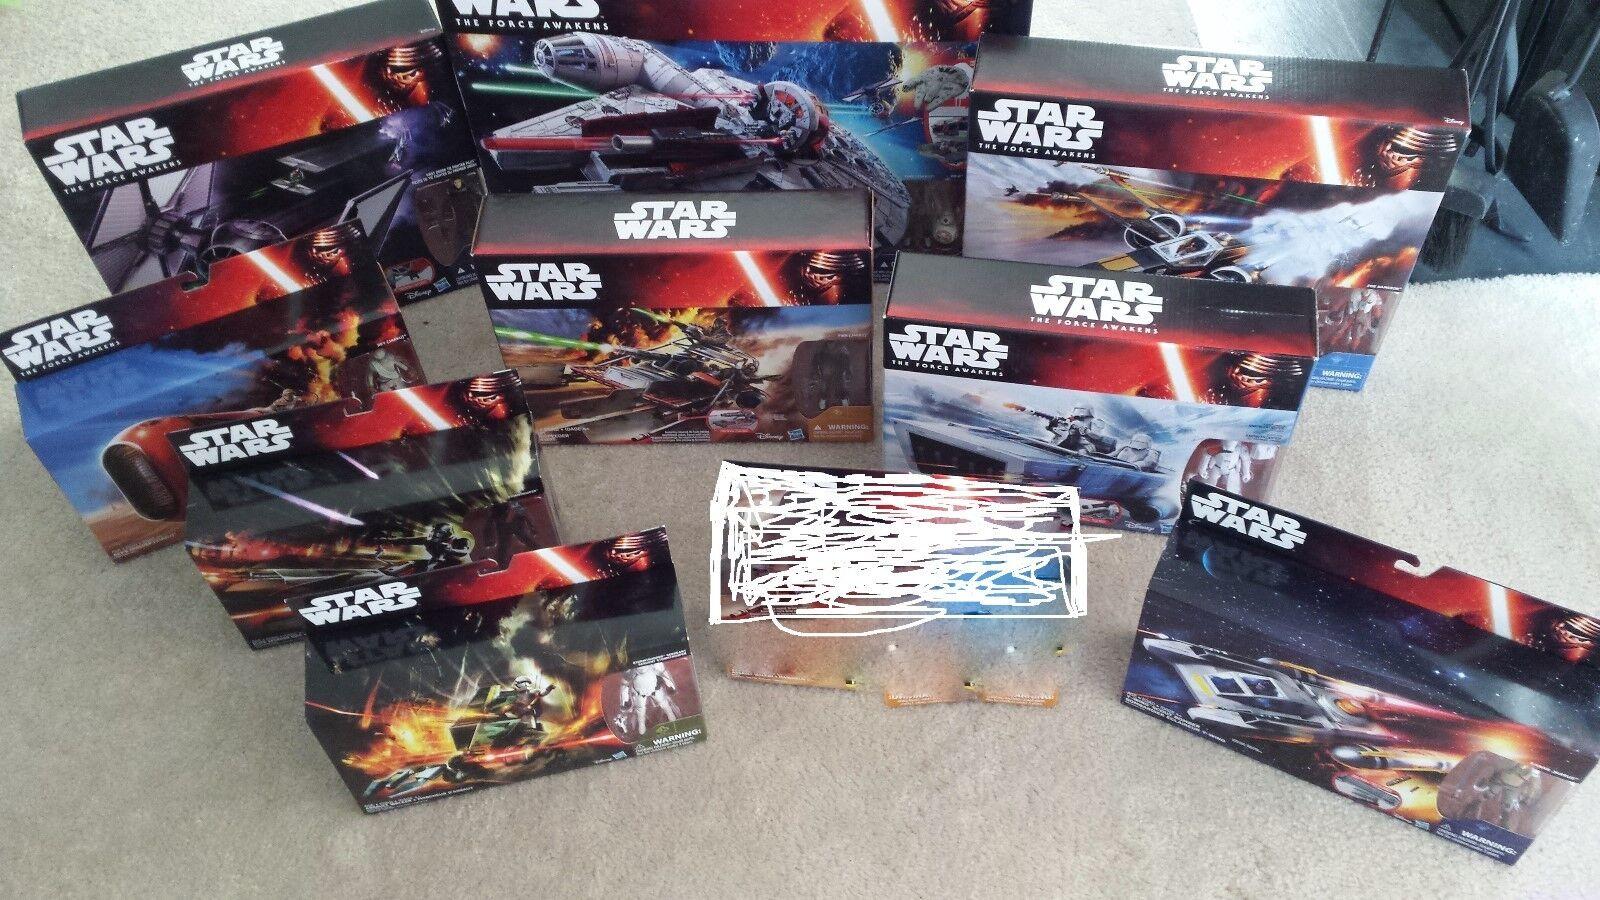 Star Wars TFA 9 Vehicle Lot 3.75  Action Figures NIB, Unopened, Hasbro